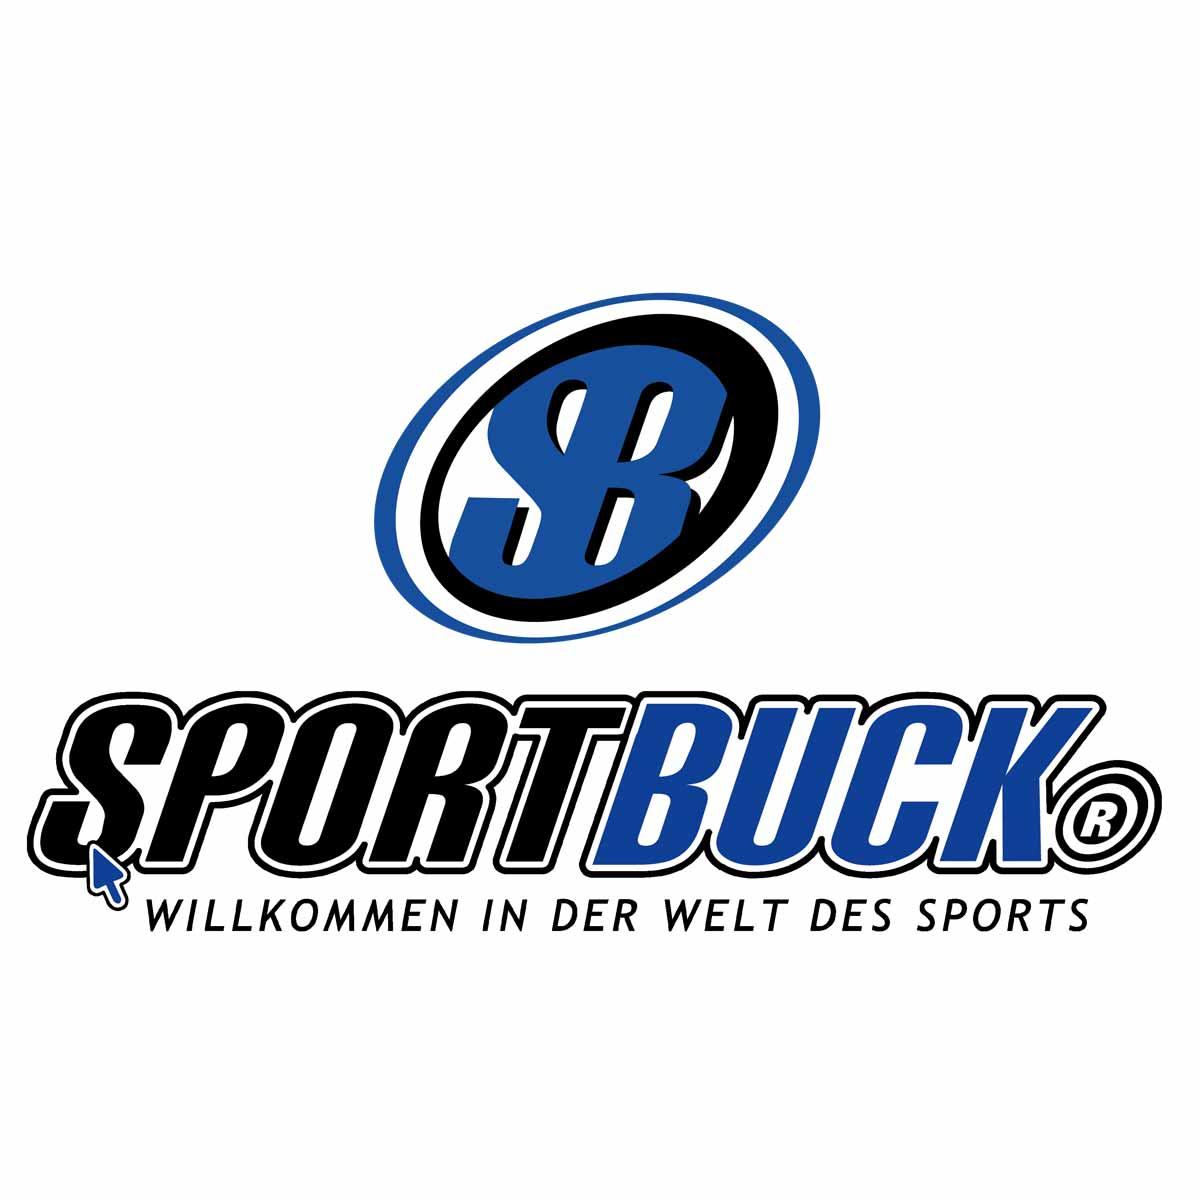 120 Cool Tec Wool Wash T-Shirt Herren Desert Orange Blend